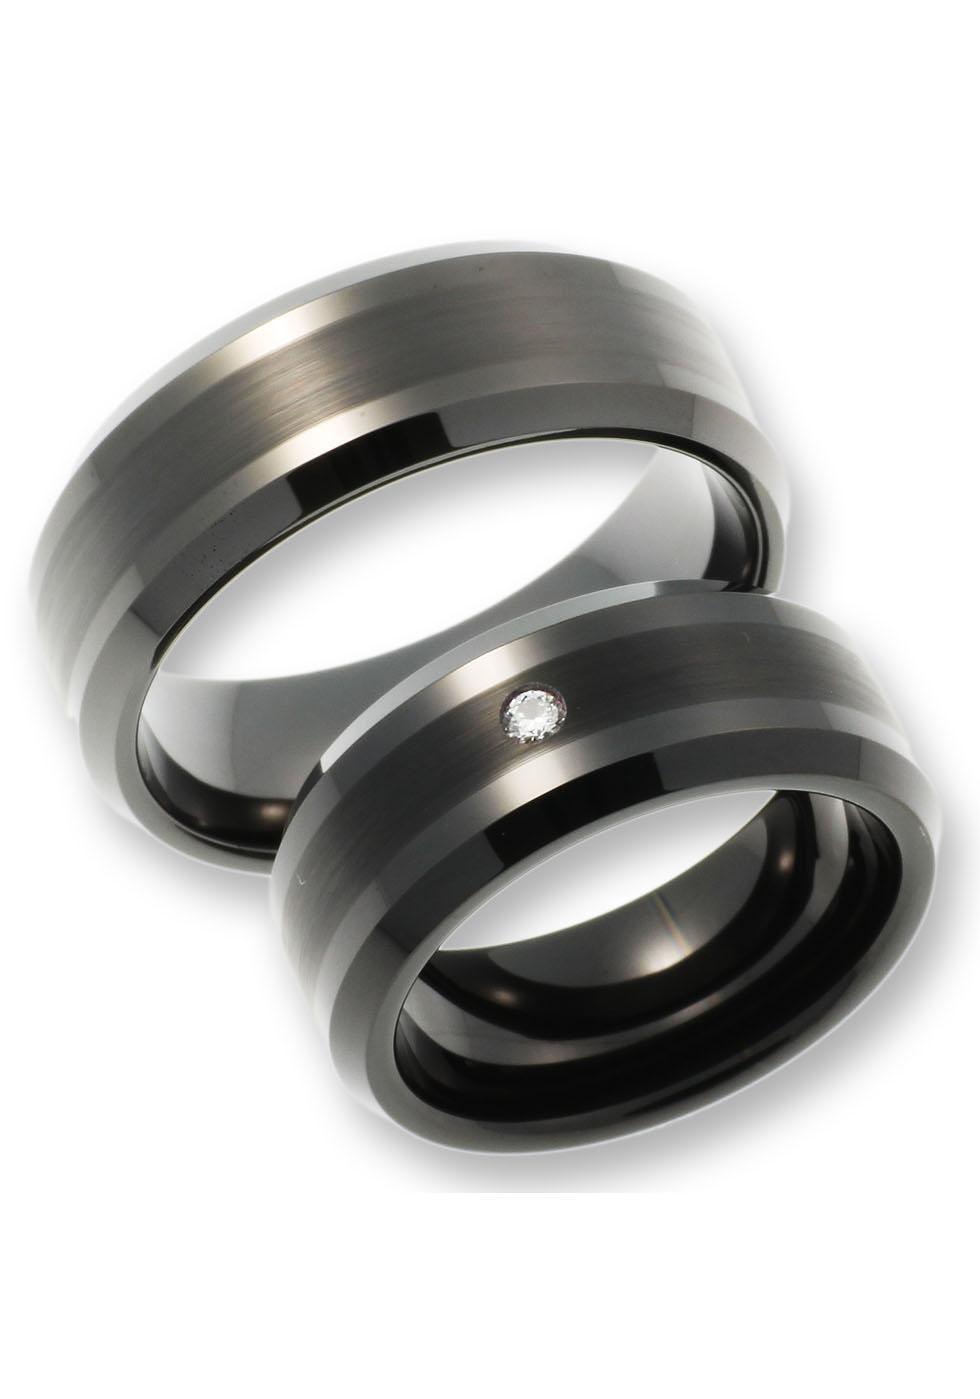 CORE by Schumann Design Partnerring »TW012.02 10008961, TW012.09 19013845«   Schmuck > Ringe > Partnerringe   CORE BY SCHUMANN DESIGN